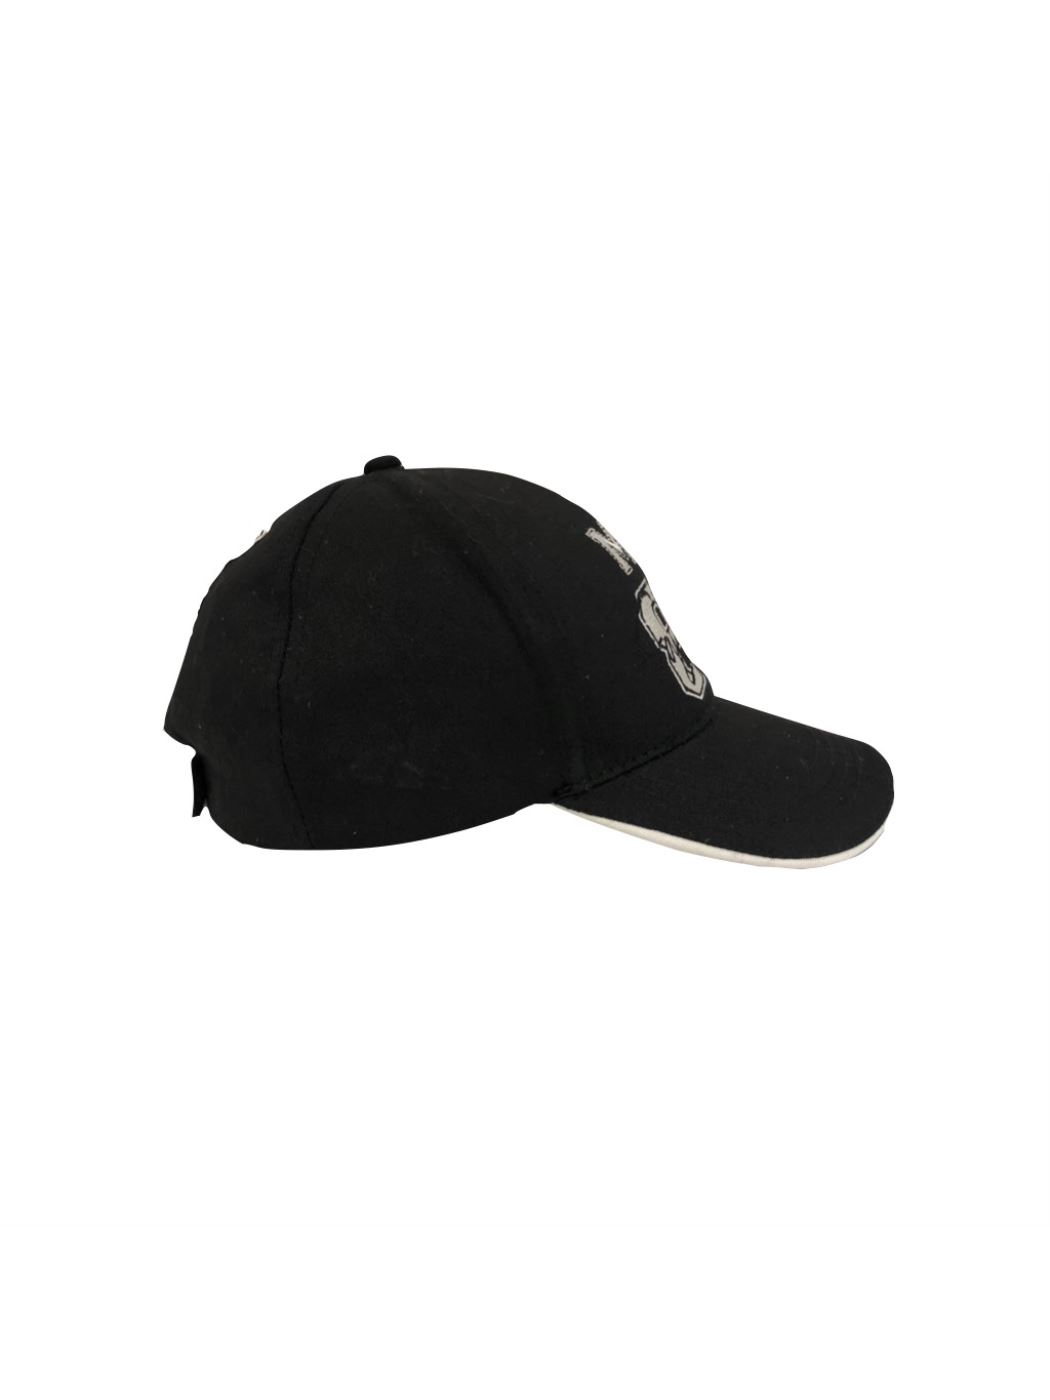 Cappello baseball con visiera